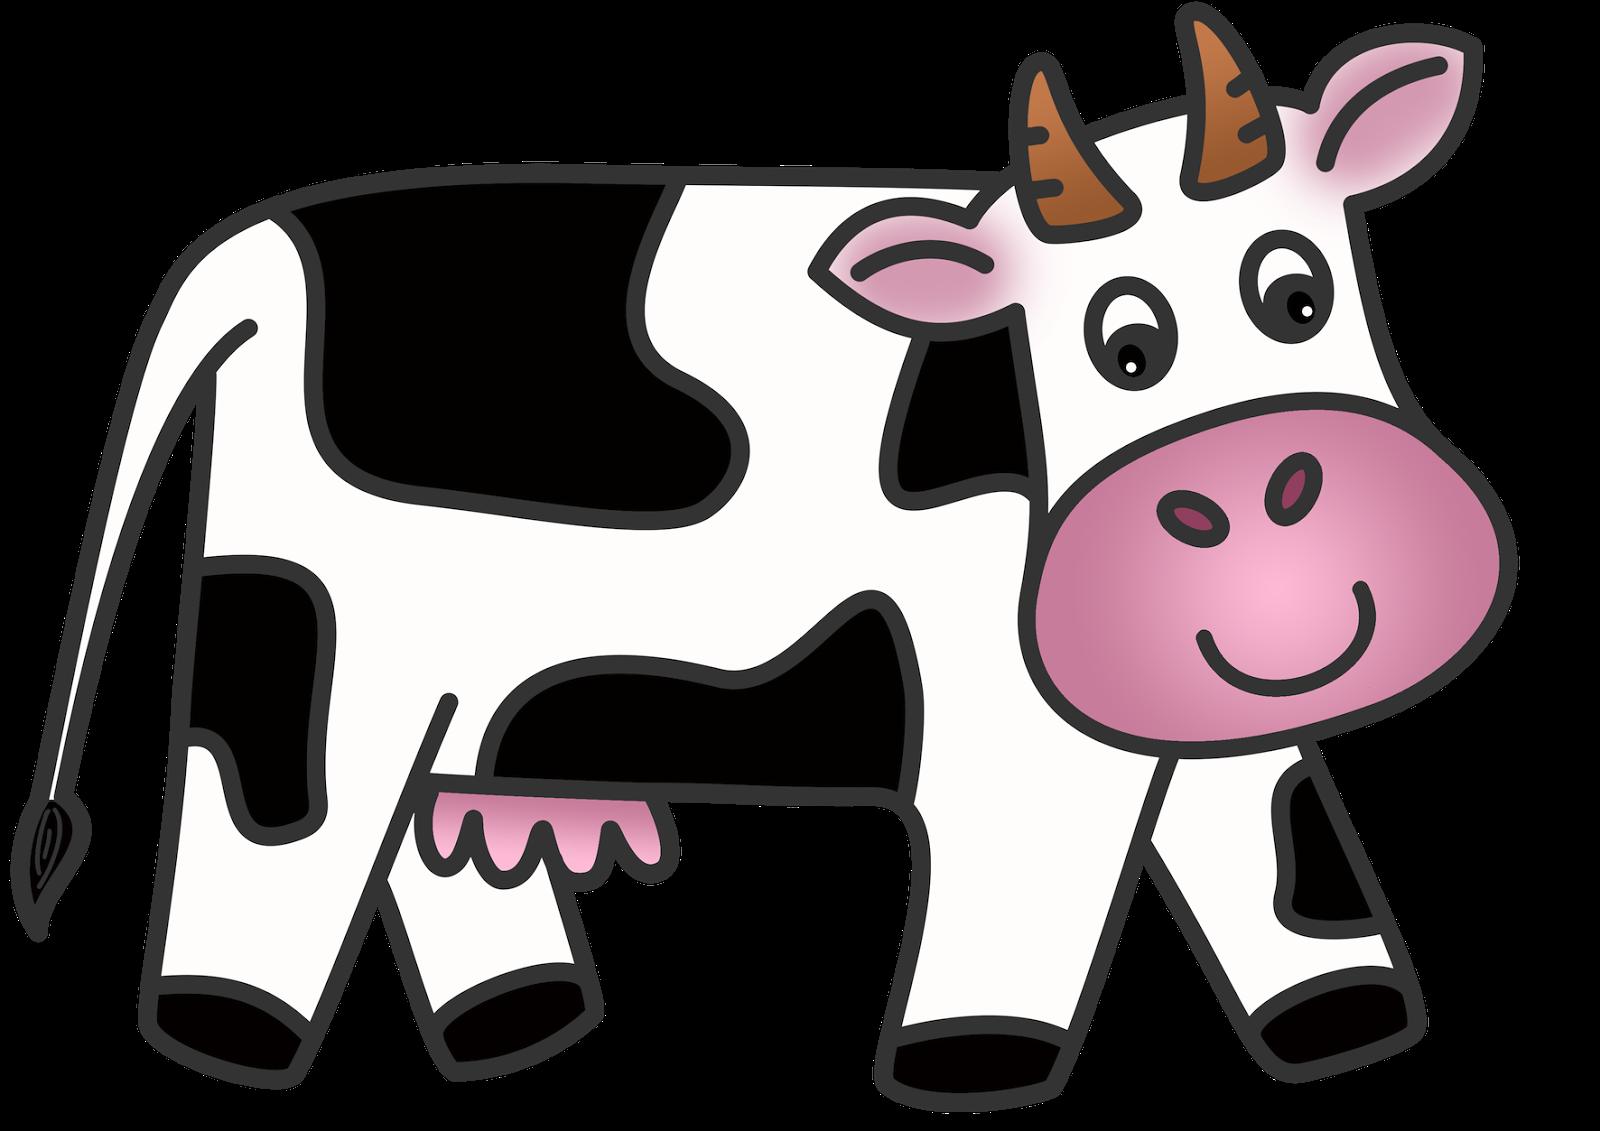 Cow Clip Art Animated Cow .-Cow Clip Art Animated Cow .-8